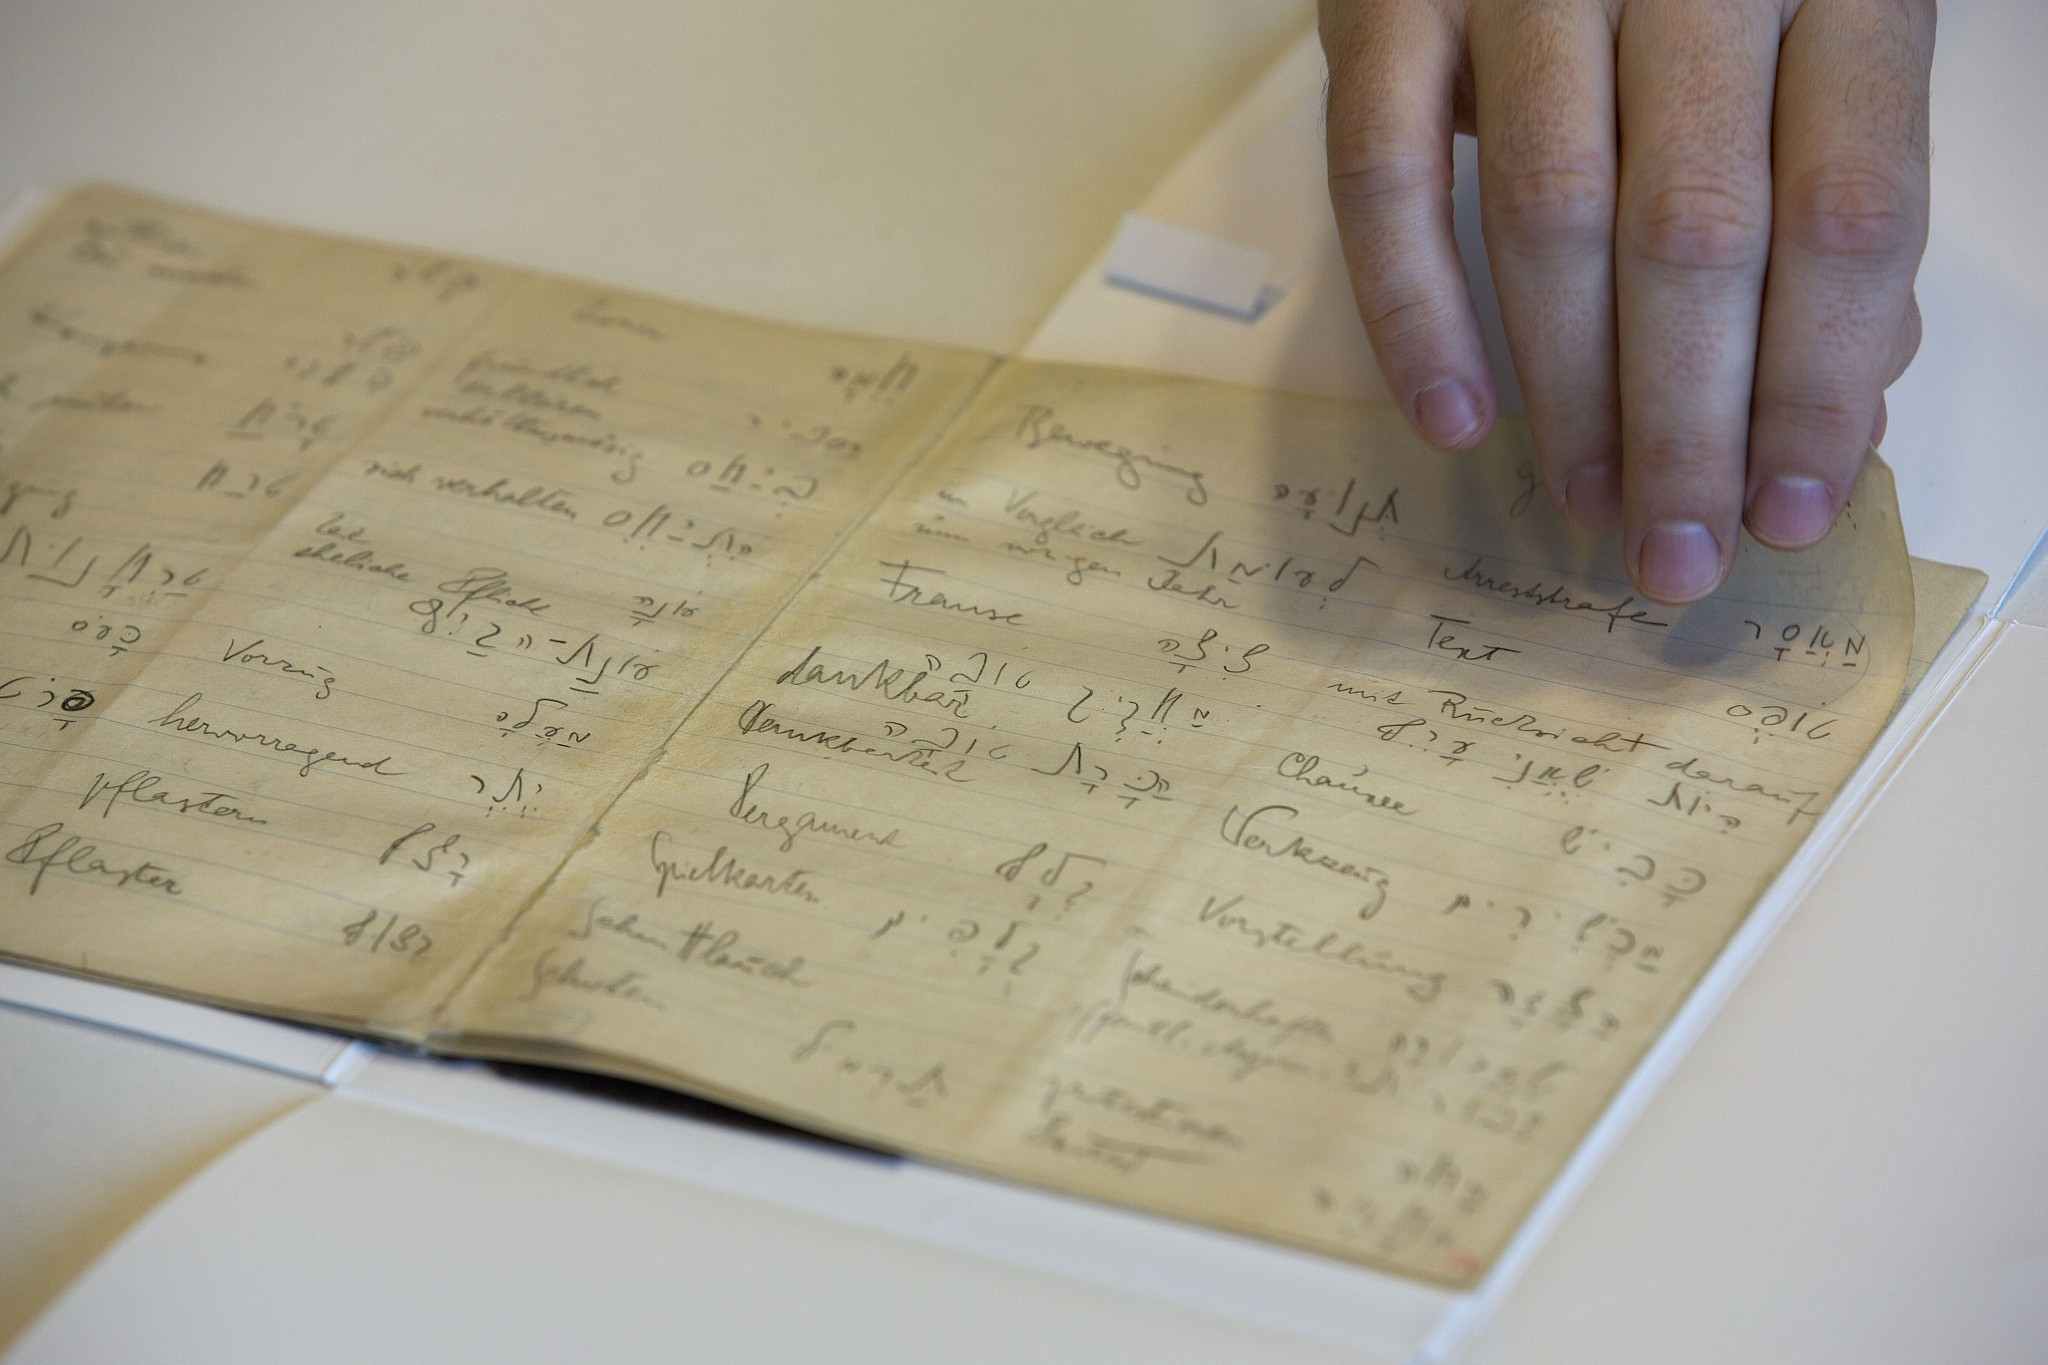 Brod-Texte nach Israel